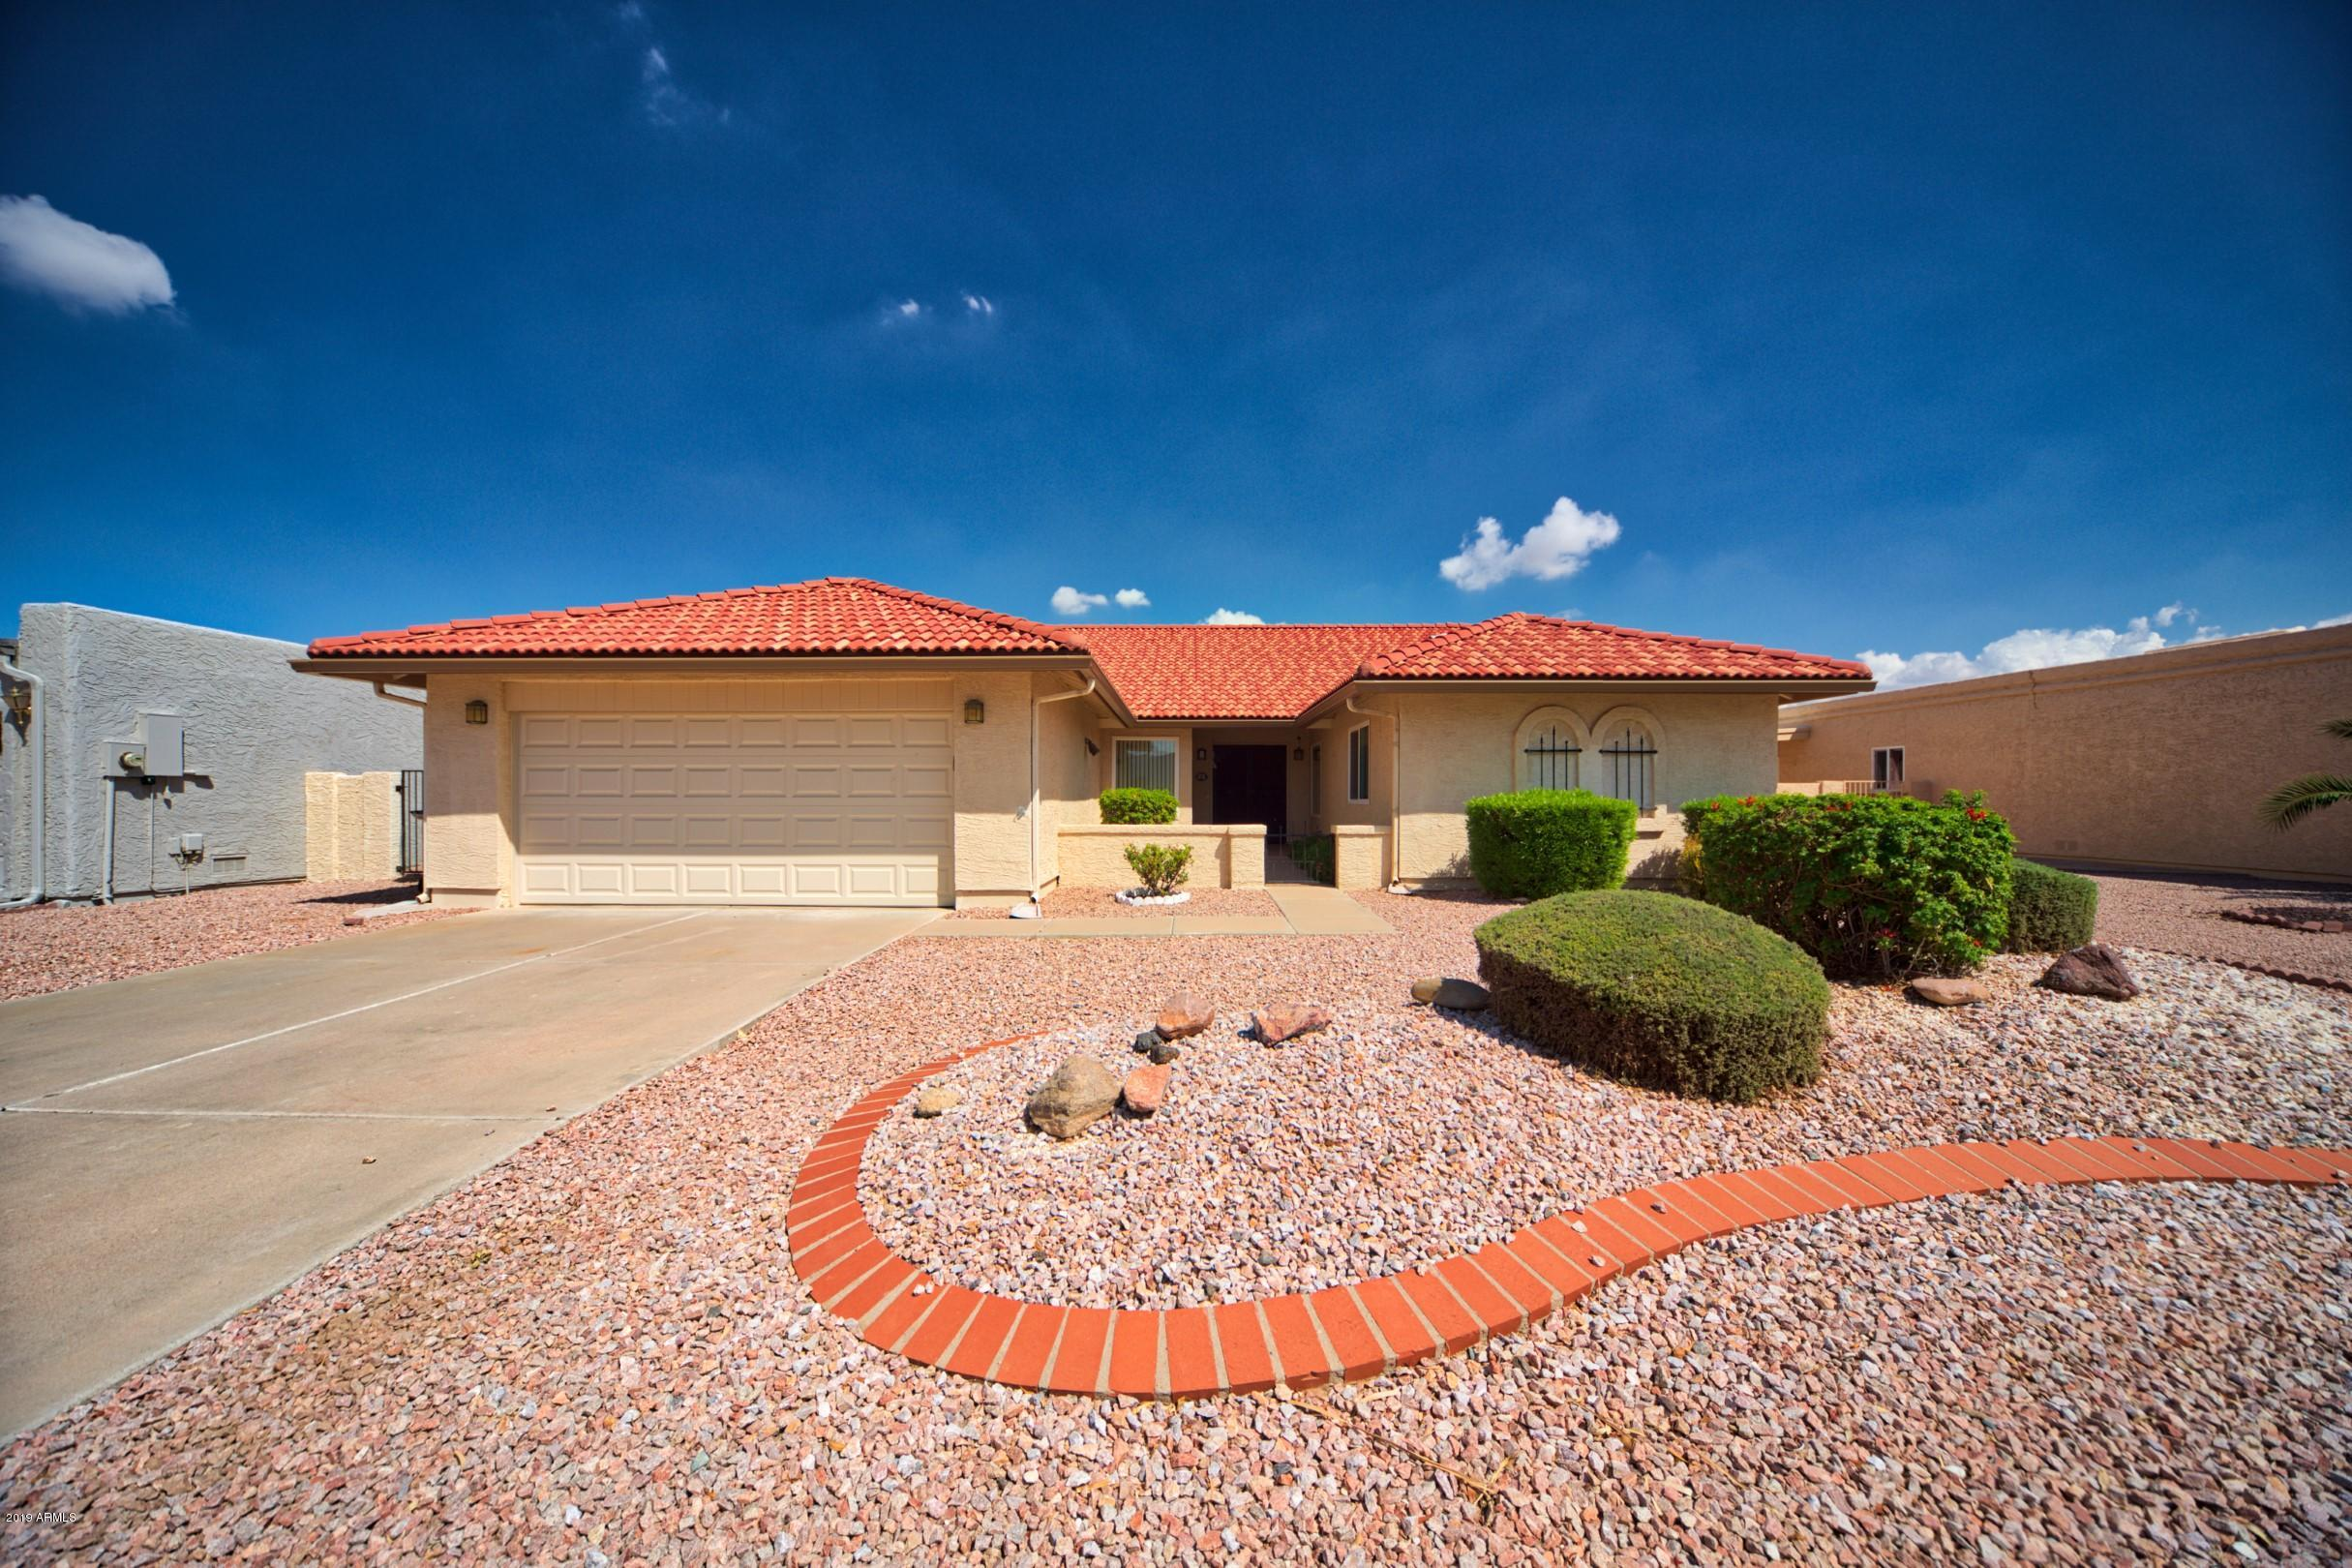 Photo for 9595 E Fairway Boulevard, Sun Lakes, AZ 85248 (MLS # 5983740)